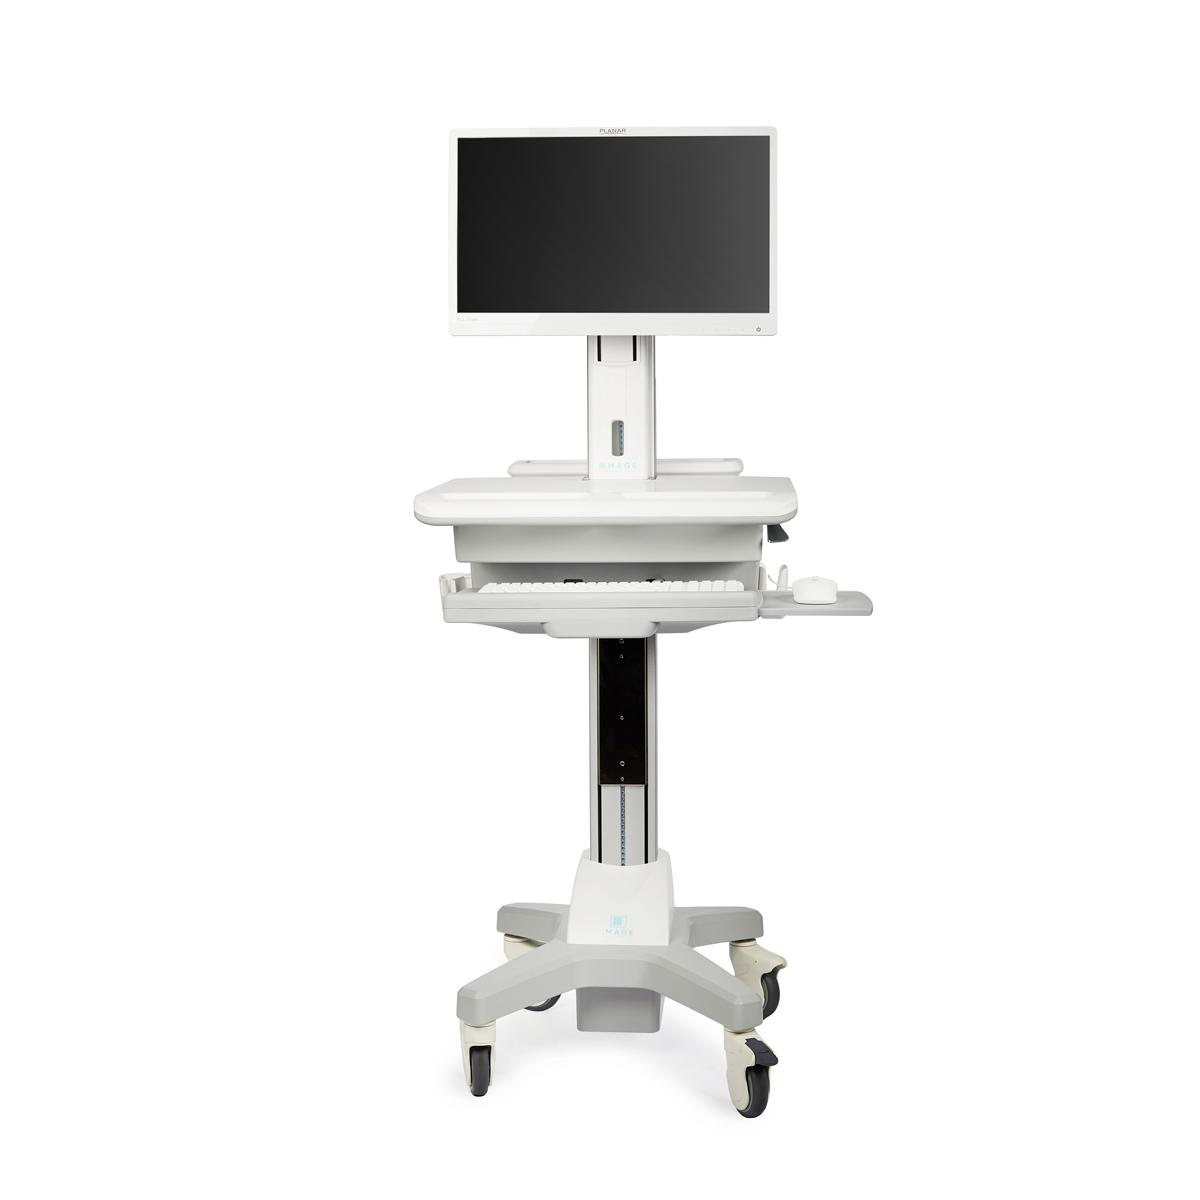 Image Technology Medical Cart